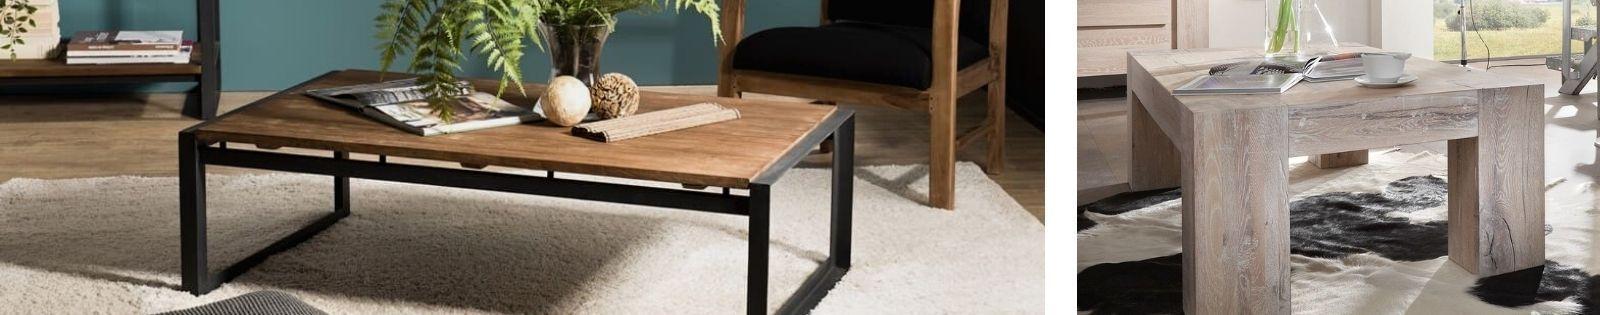 Table basse en bois massif : acacia, chêne, hévéa, teck... Lotuséa